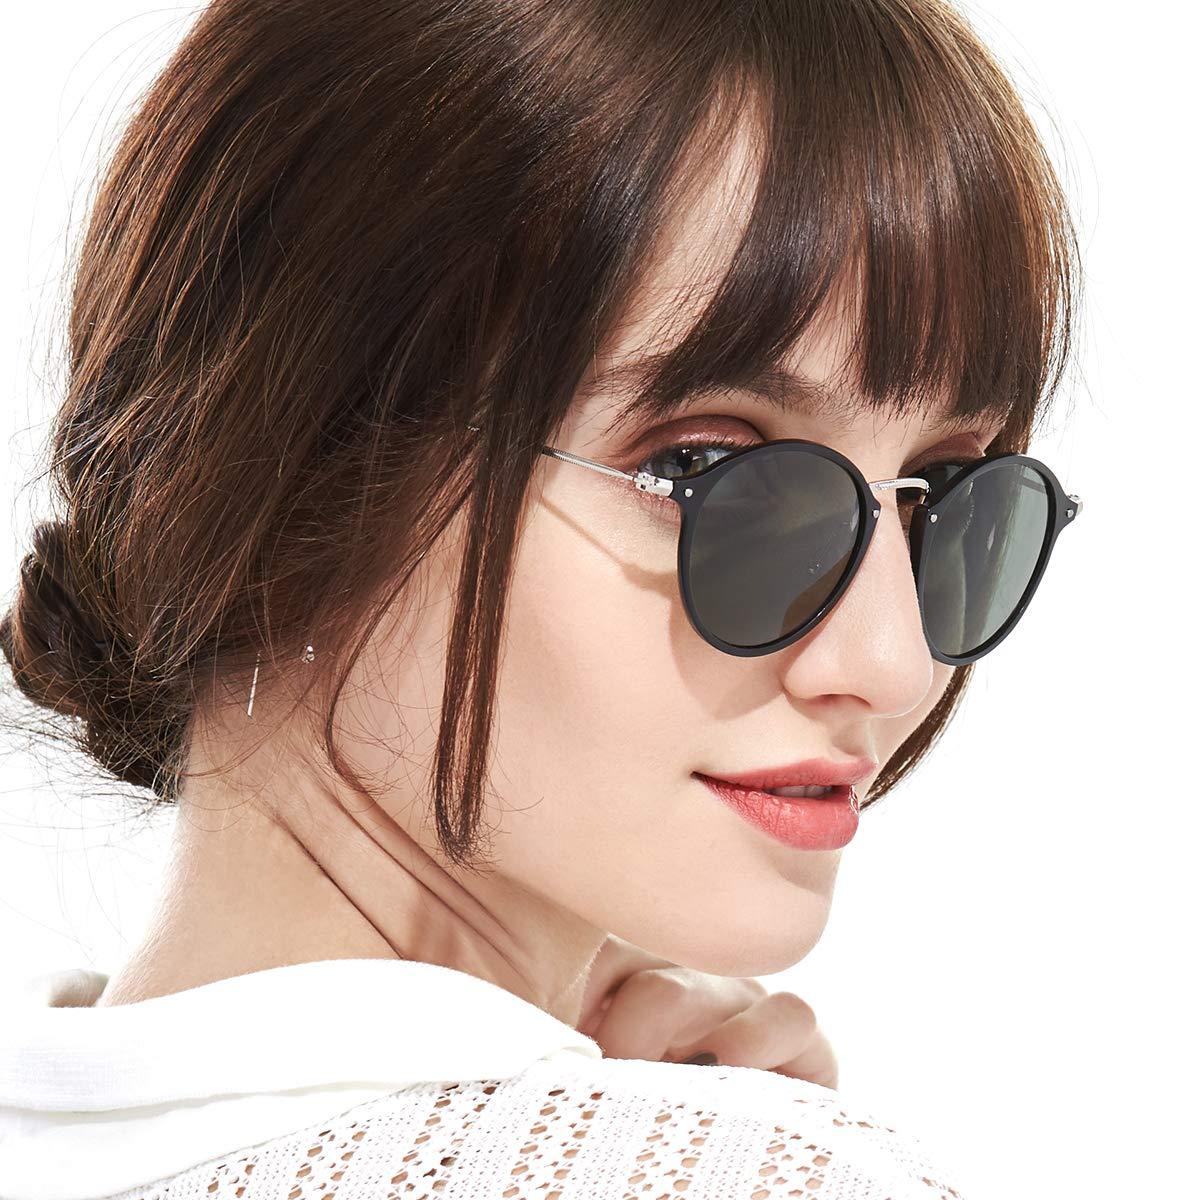 Retro Polarized Round Sunglasses for Women Vintage Circle Style 100% UV Protection(Black Frame/Green Lens) by SODQW